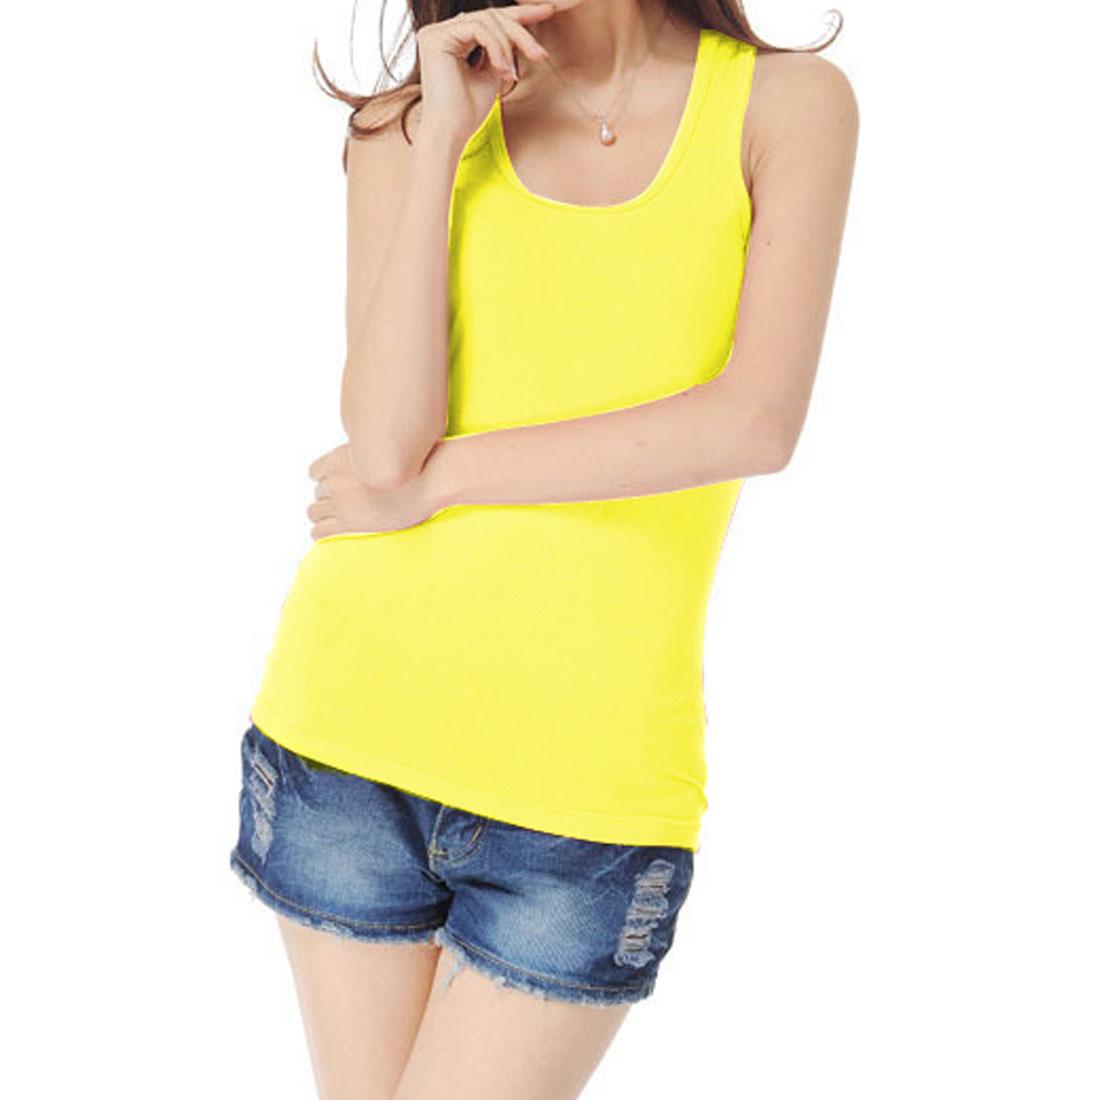 Ladies Solid Yellow Sleeveless Pullover Elastic Racerback Tank Top XS